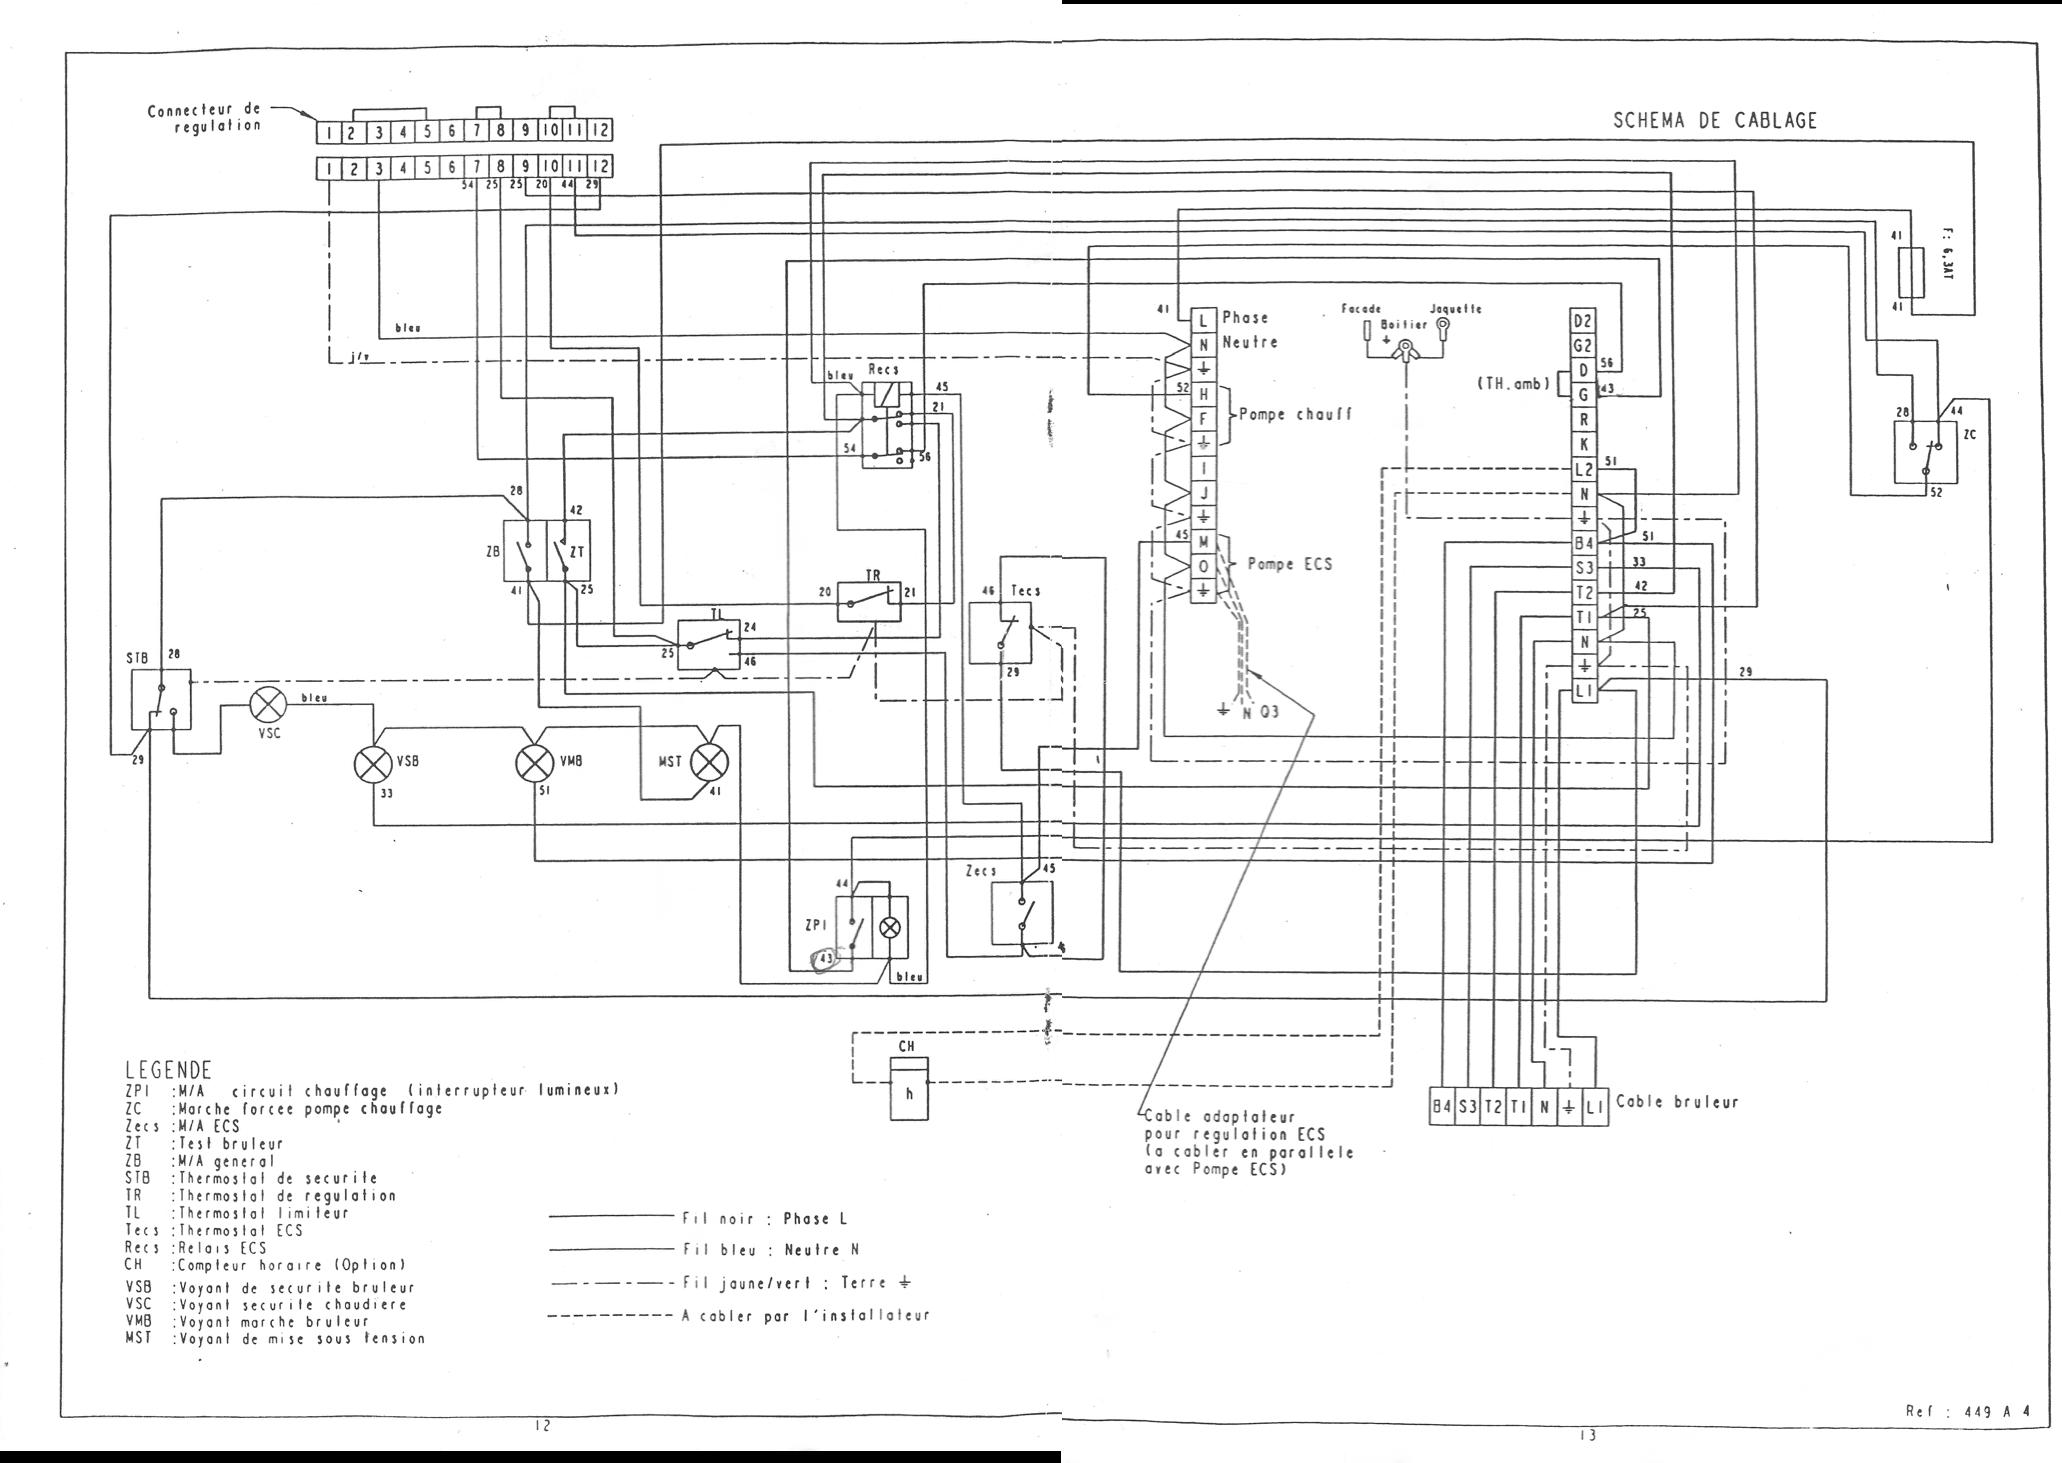 branchement chaudi re eau sanitaire thermostat nest 3 page 1 r gulations et thermostats d. Black Bedroom Furniture Sets. Home Design Ideas